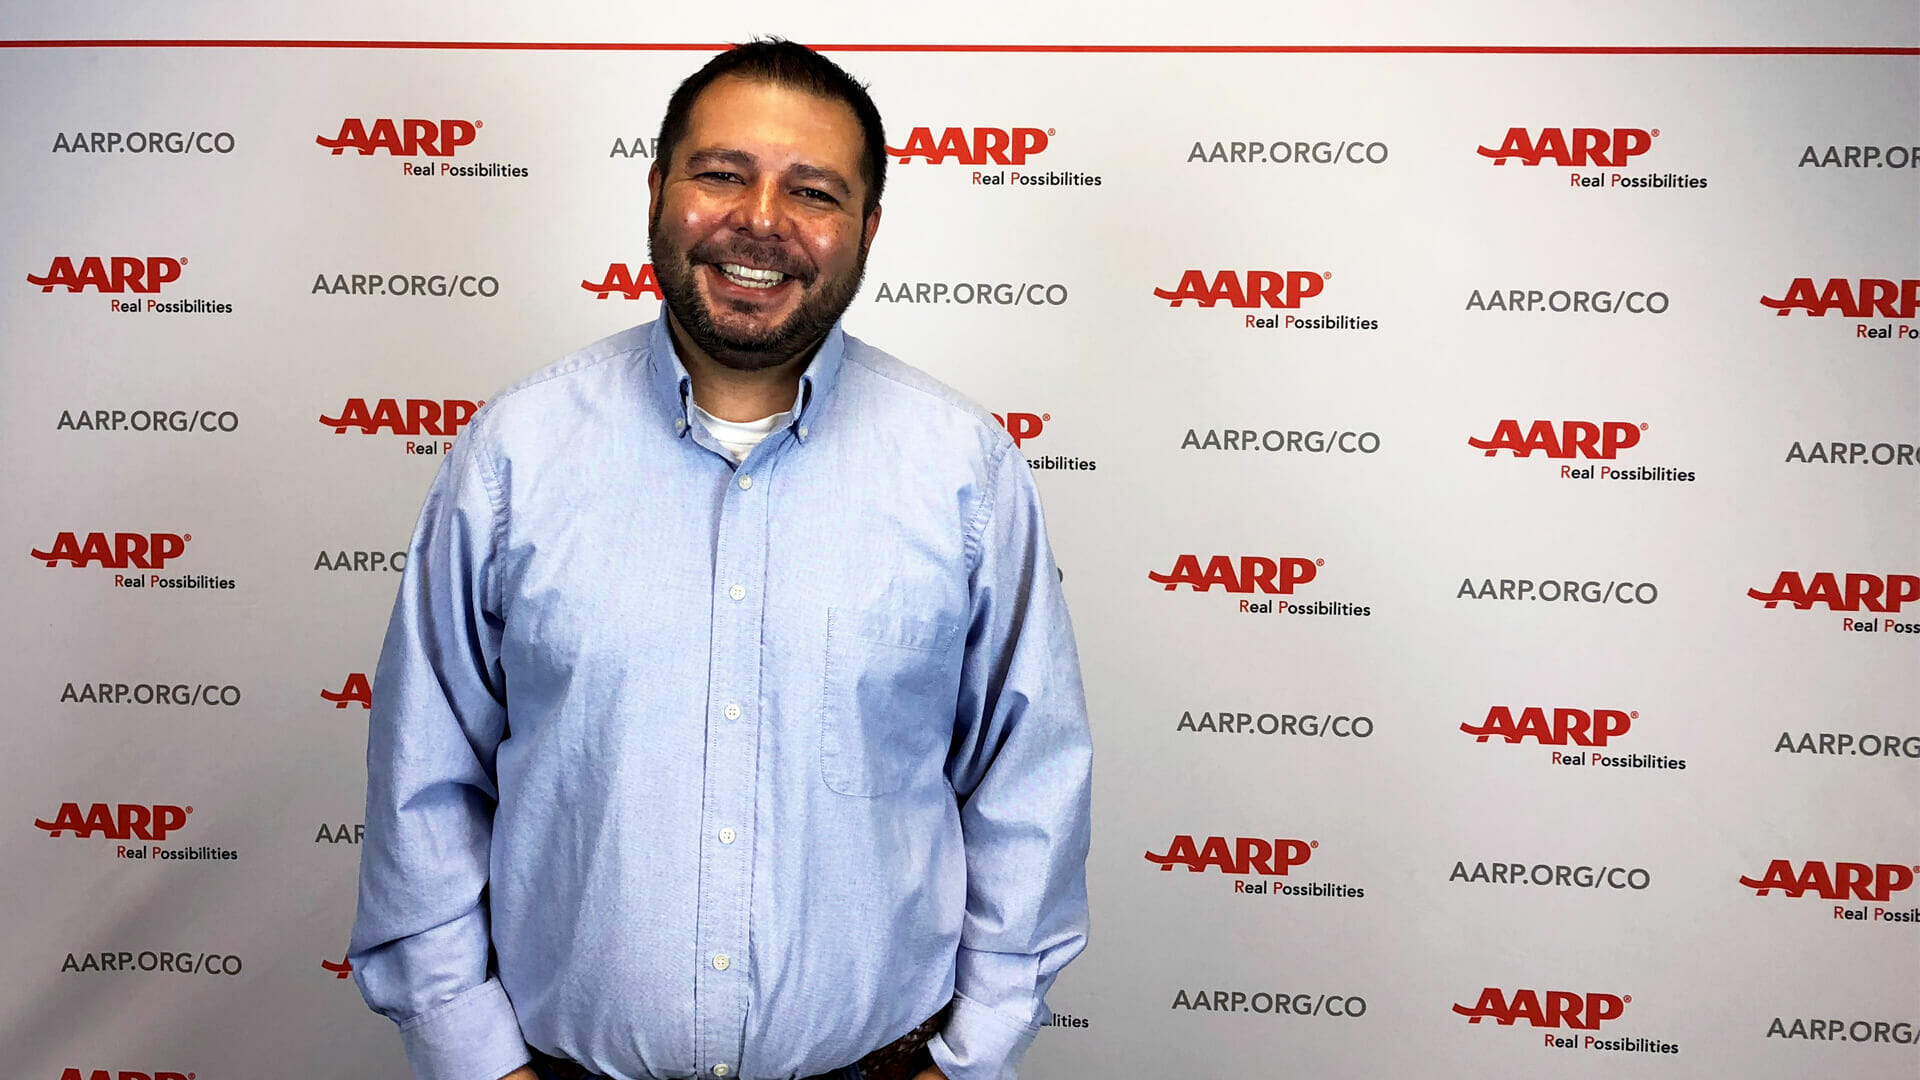 Jeremiah Mora, AARP